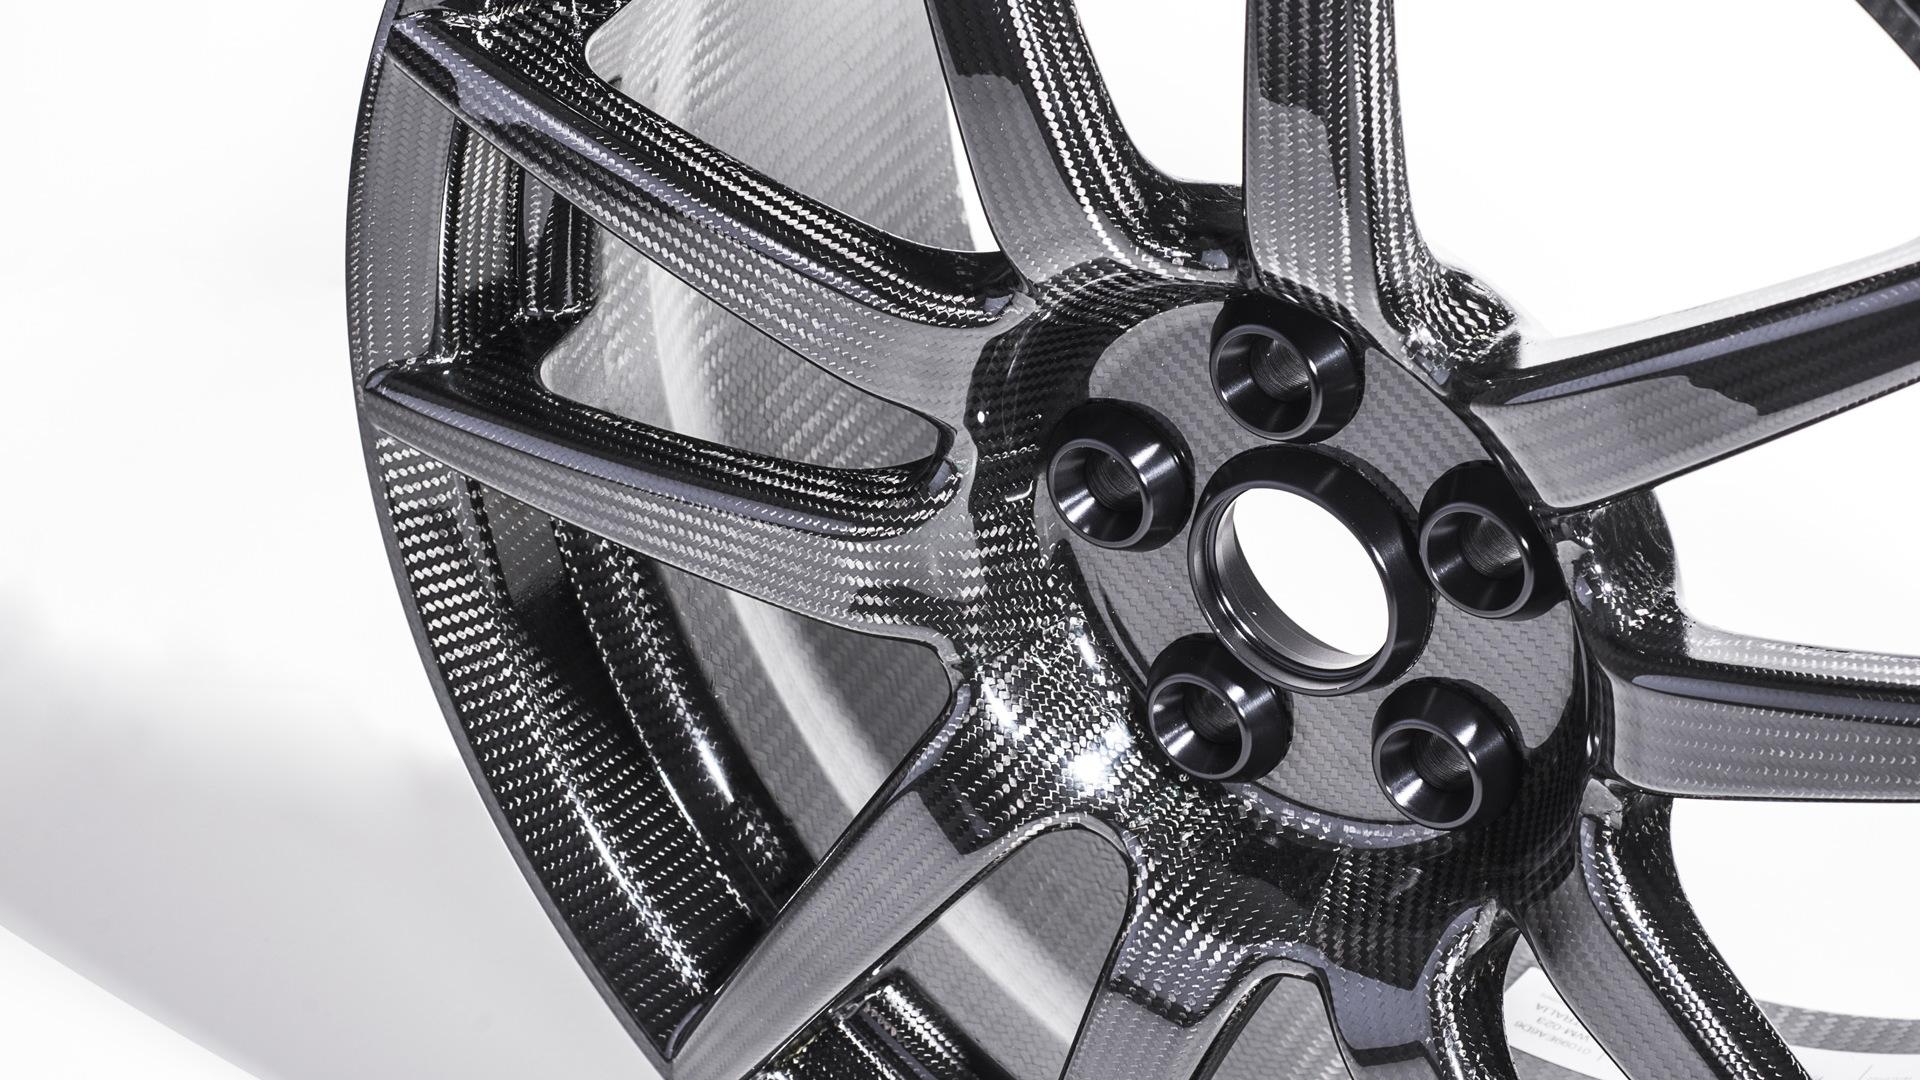 Ford GT's carbon fiber wheels